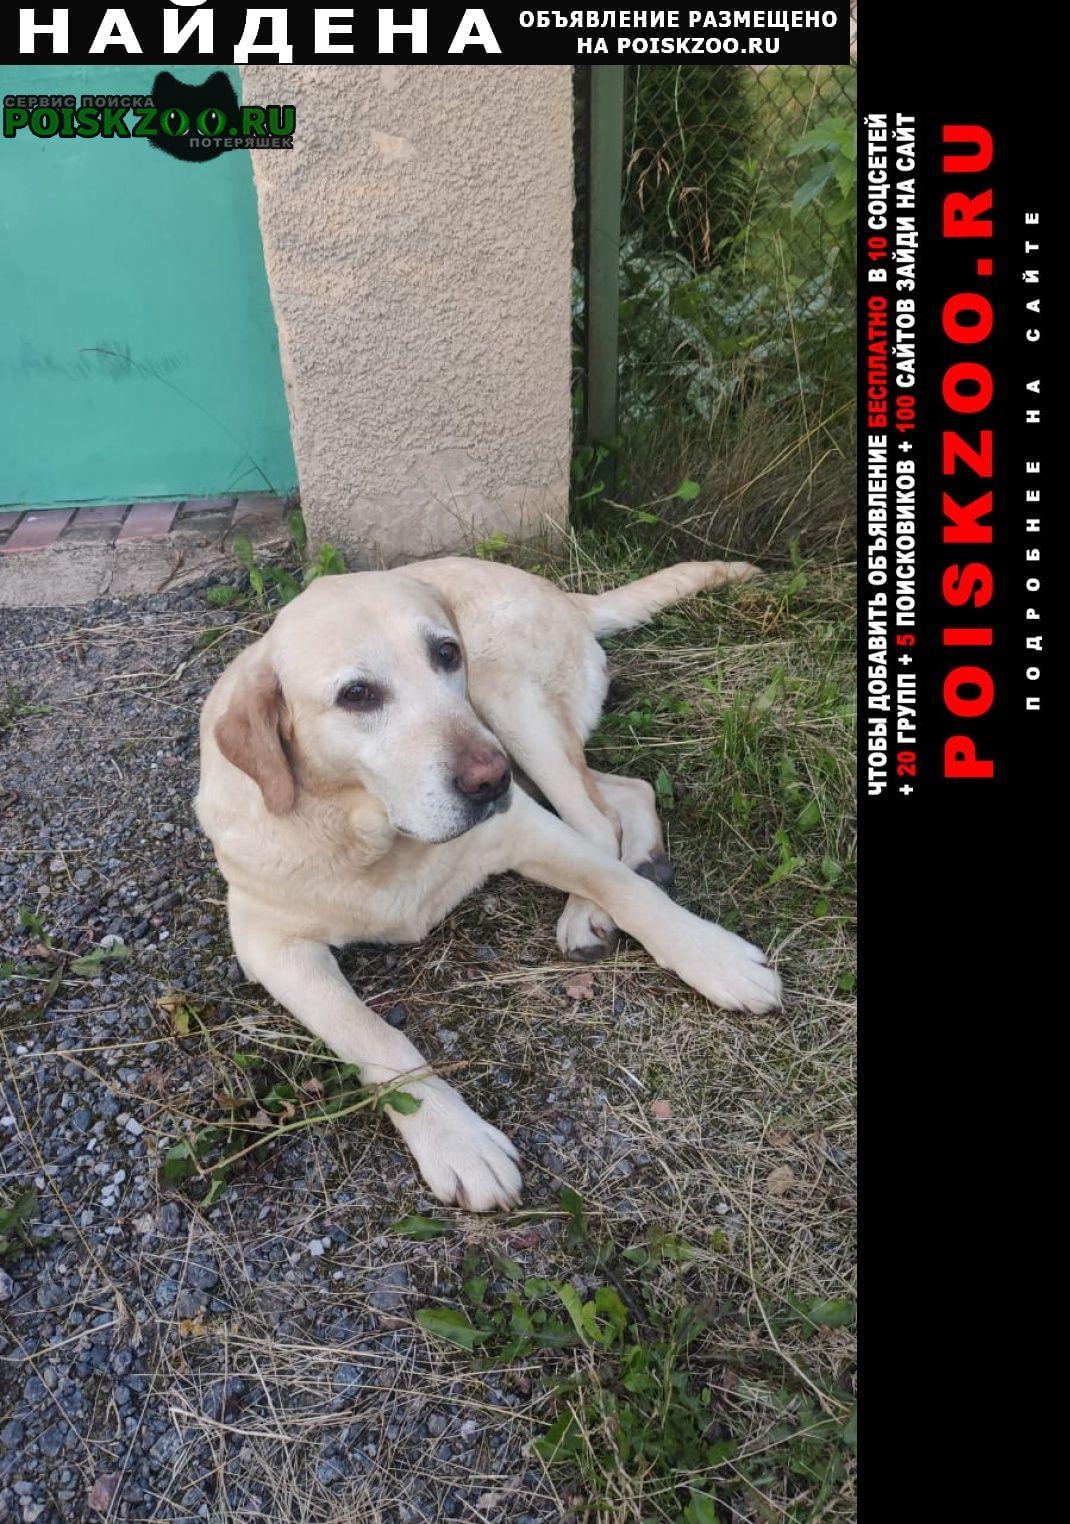 Найдена собака белый лабрадор, сука Истра